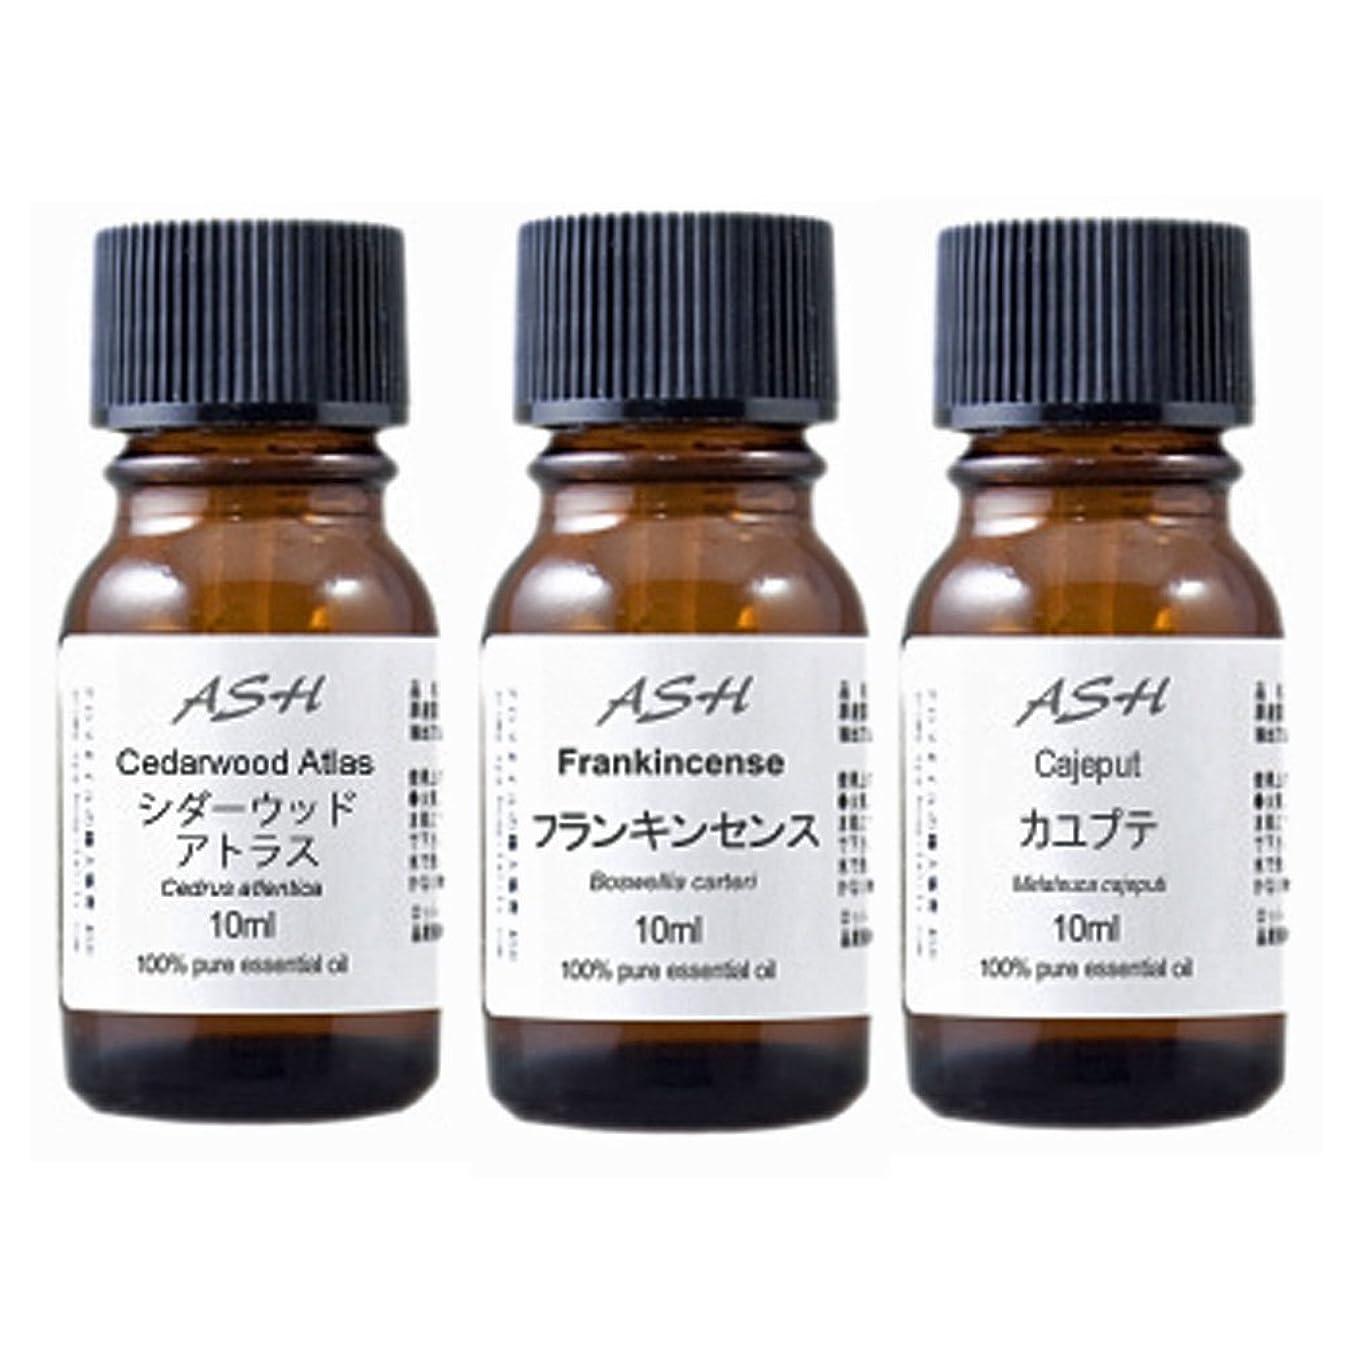 ASH エッセンシャルオイル 10mlx3本セット【アロマオイル 精油】(メディテーション)フランキンセンス シダーウッドアトラス カユプテ AEAJ表示基準適合認定精油